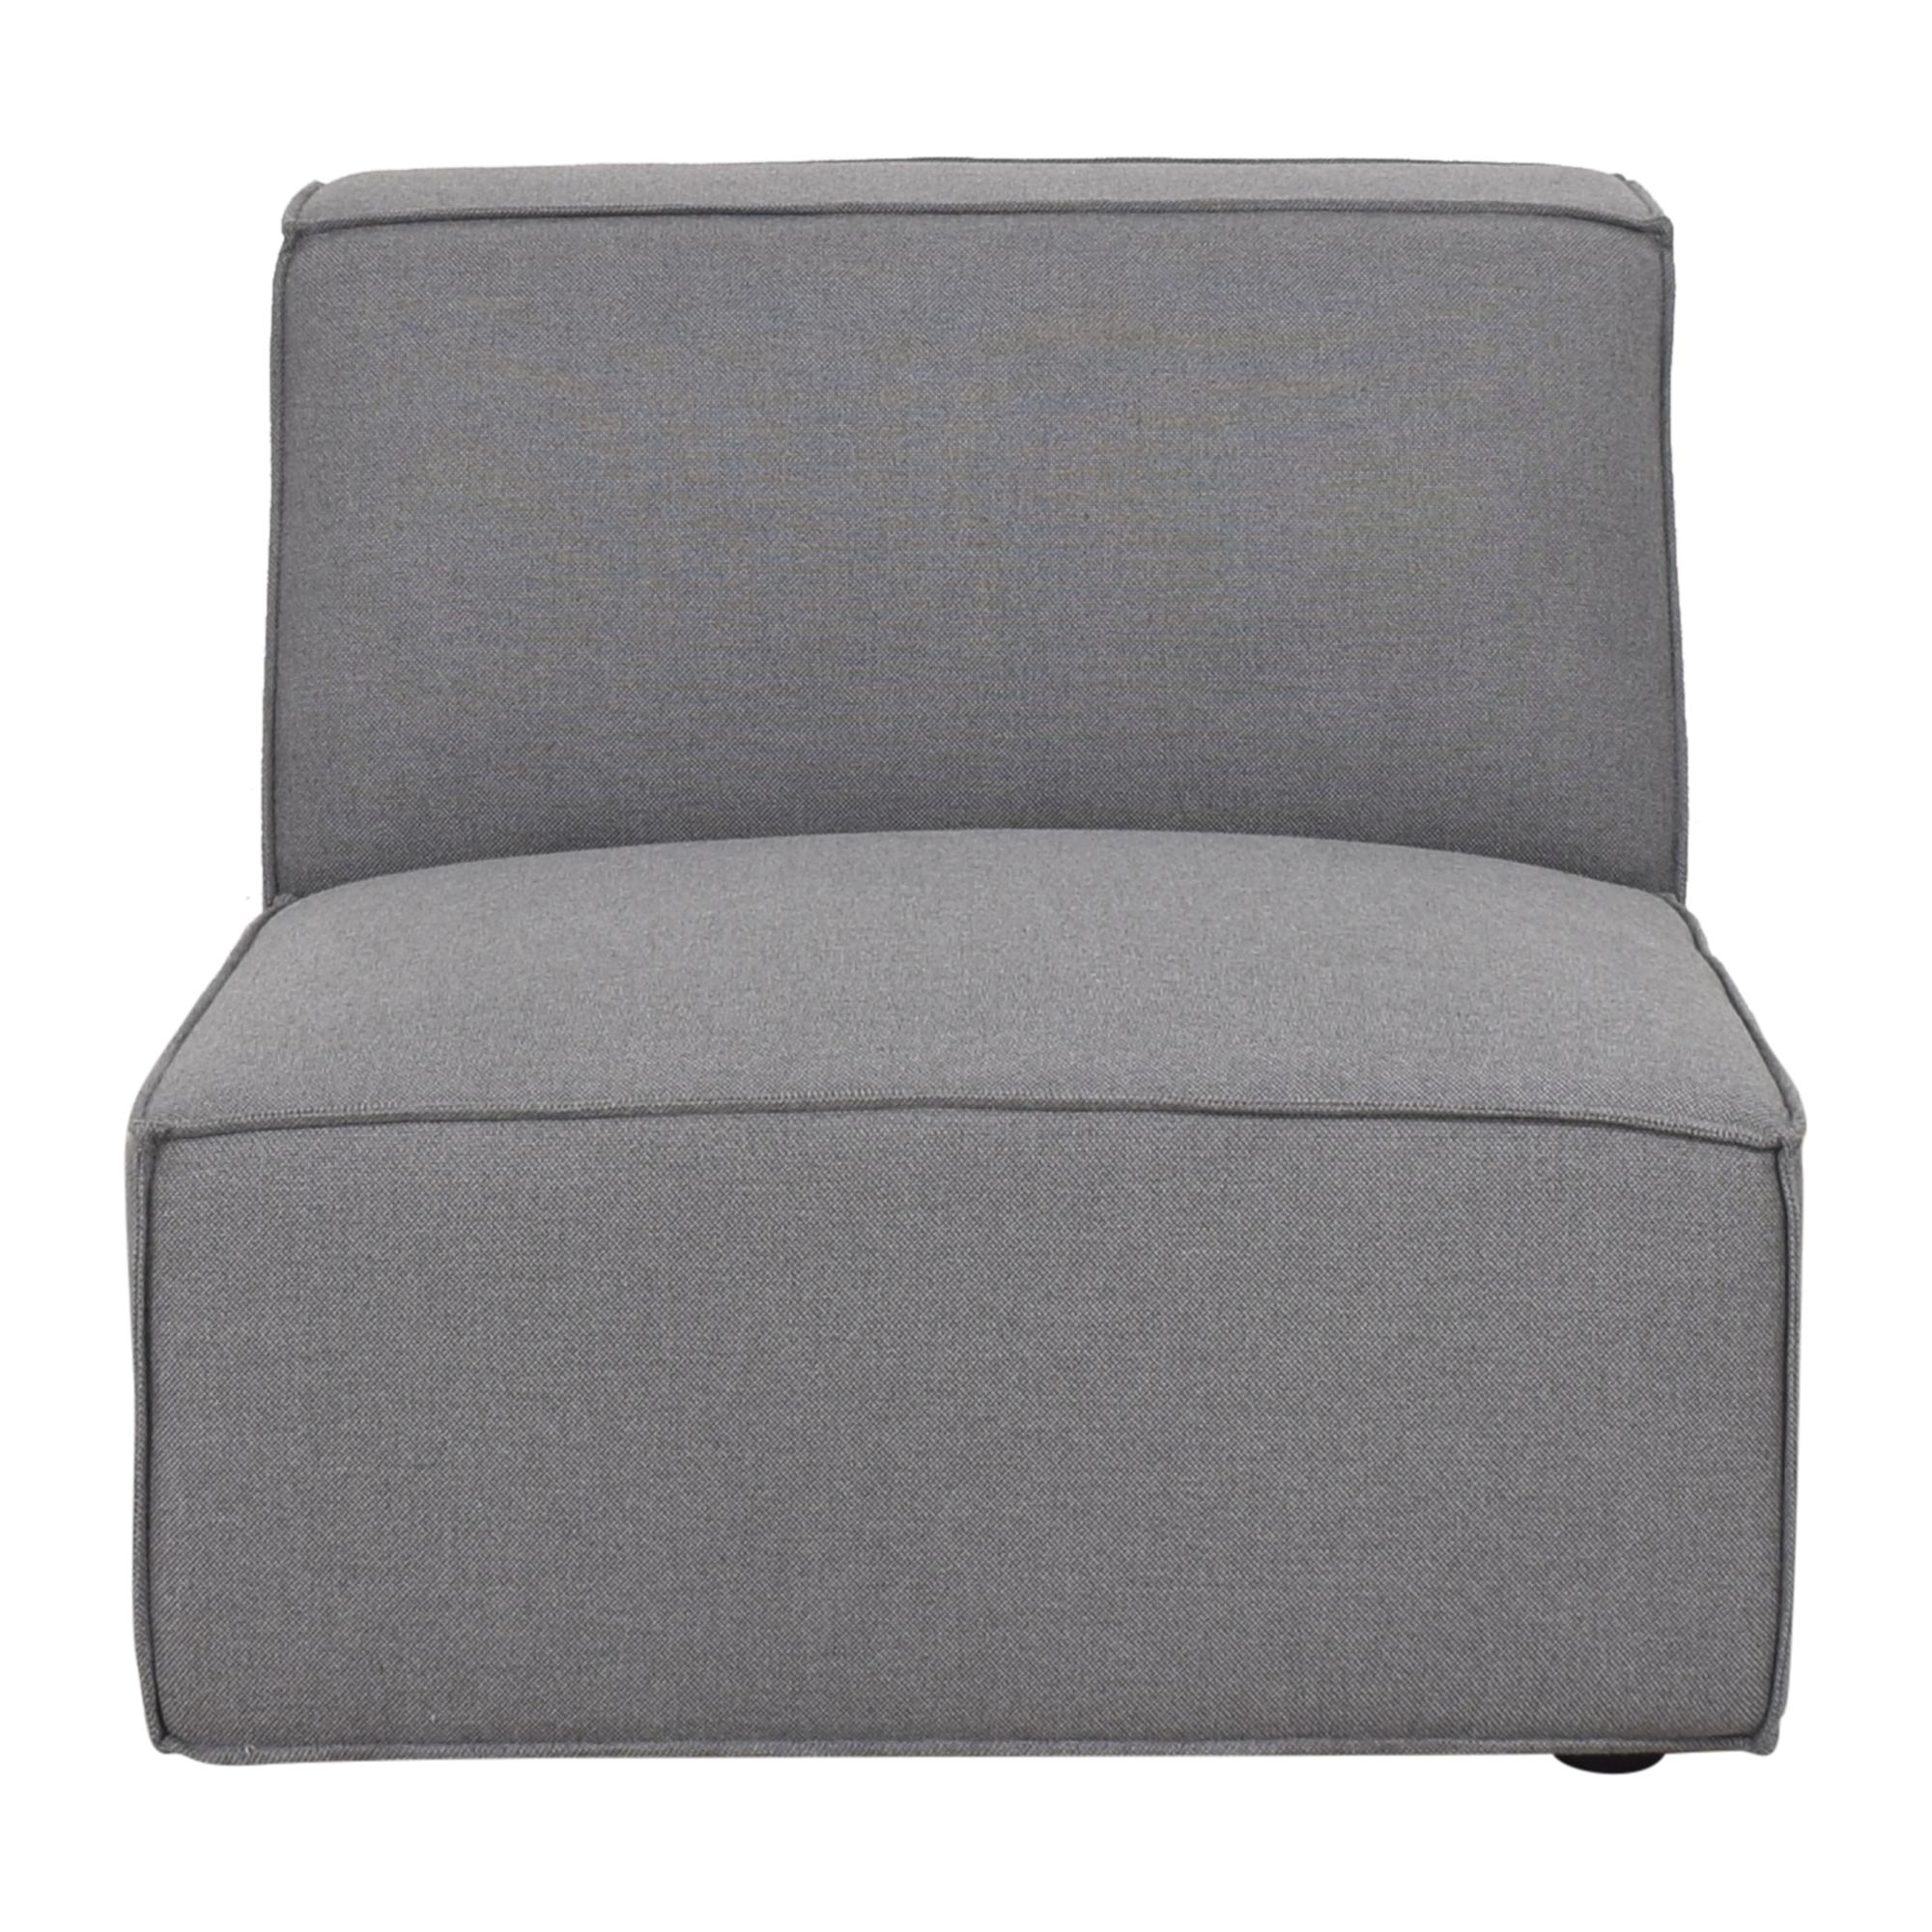 buy Rove Concepts Porter Armless Grande Chair Rove Concepts